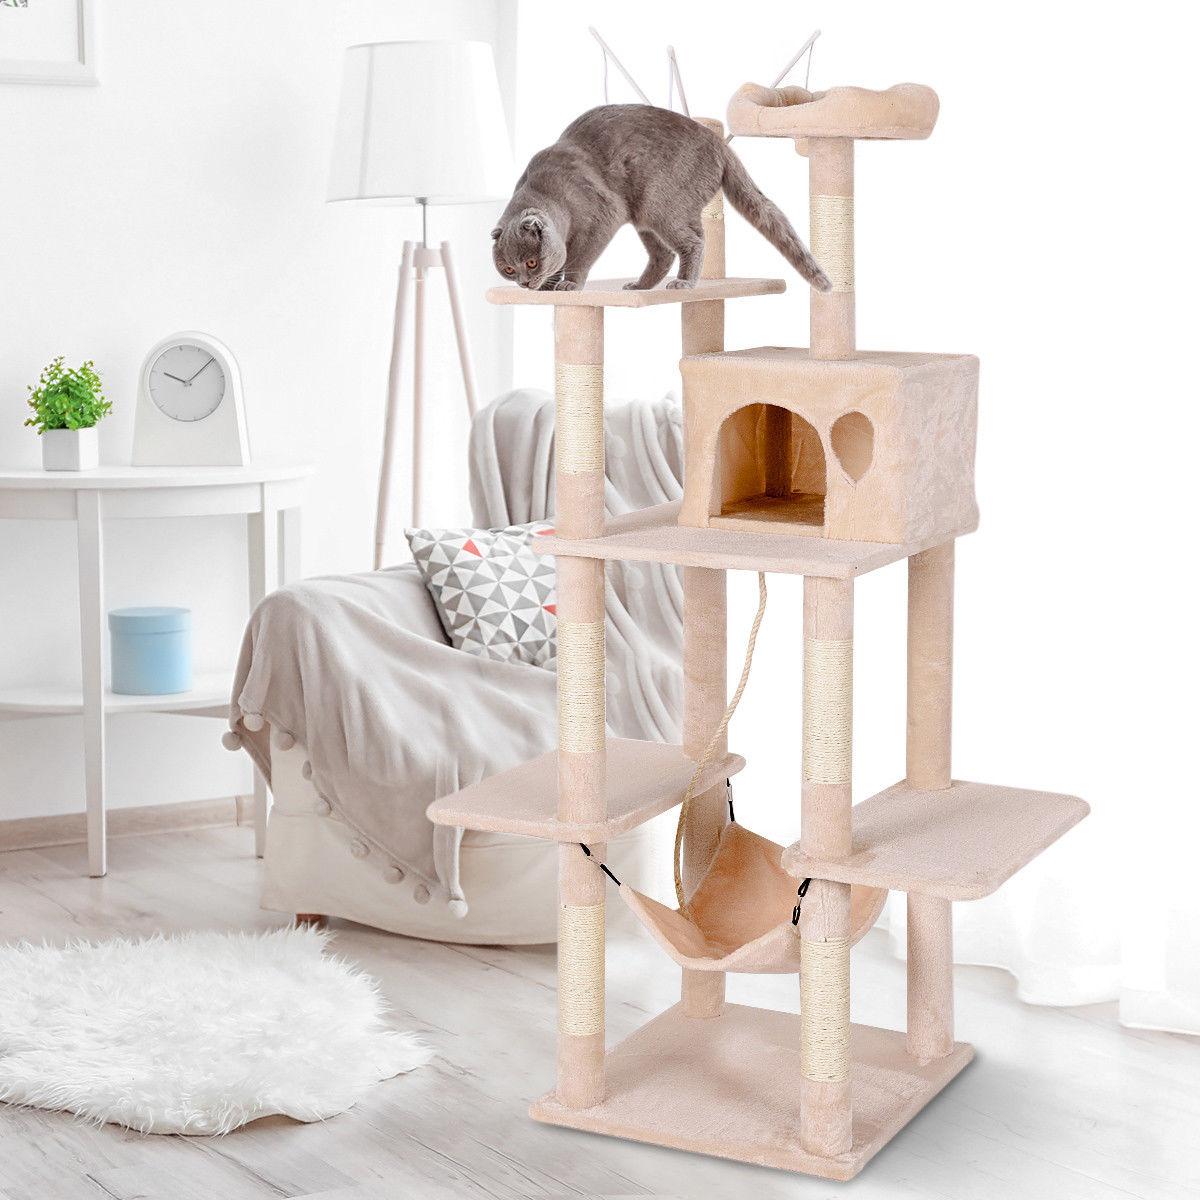 Tall Cat Tree Multilevel Activity Tower Condo W Hammock